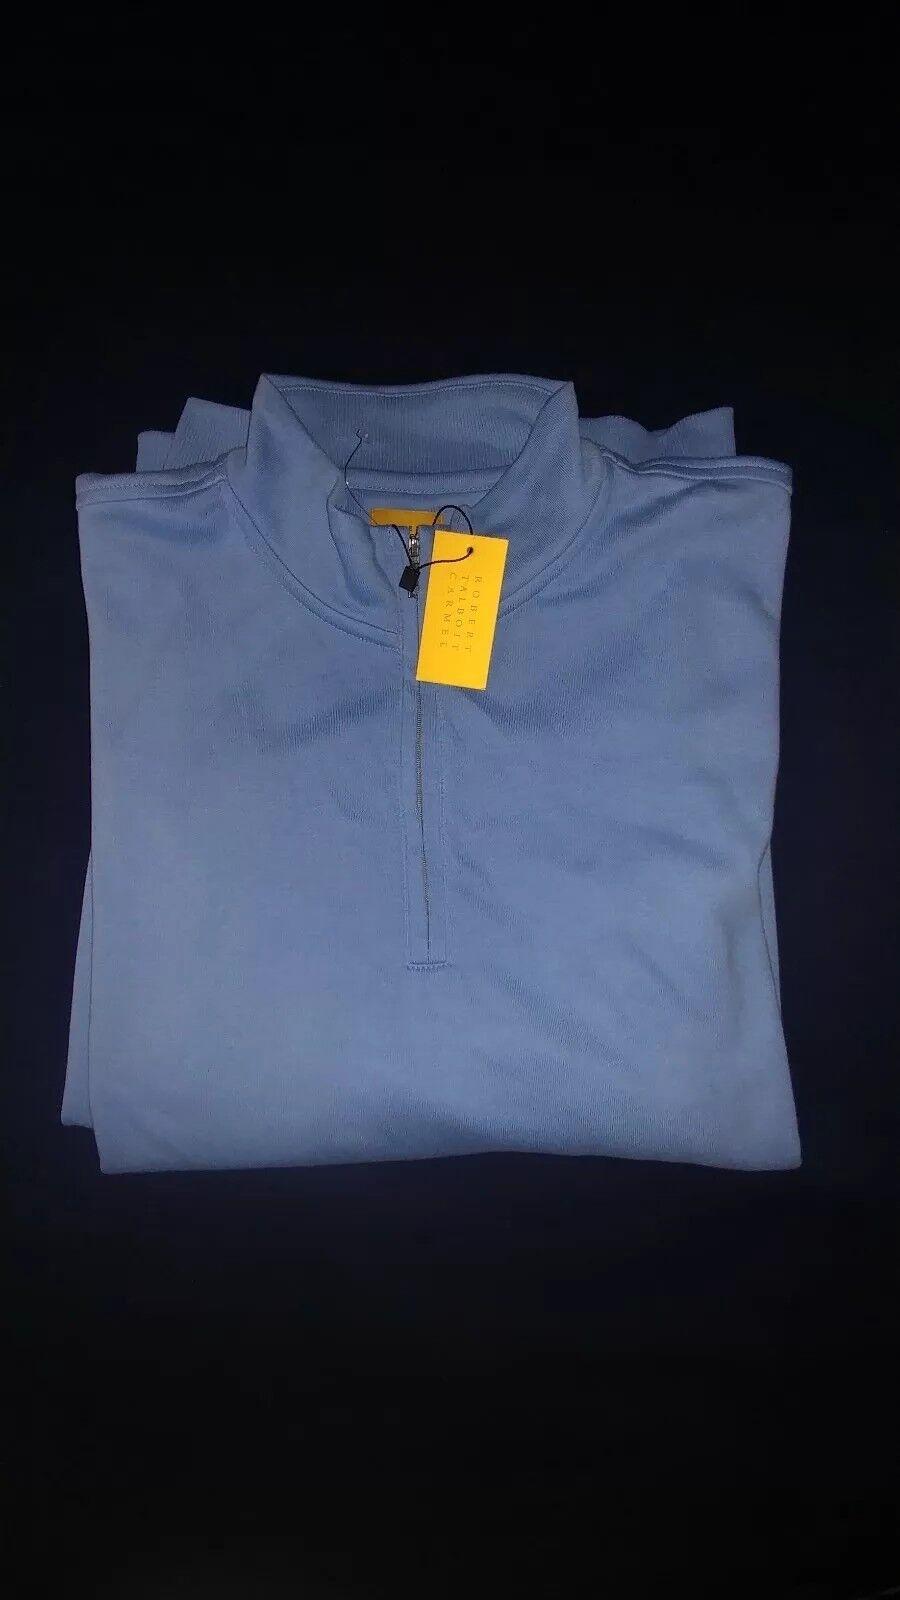 145 145 145 NWT Robert Talbott Carmel  Herren Blau 1/4 Zip Sweater 100% Pima Cotton Sz L 84b686